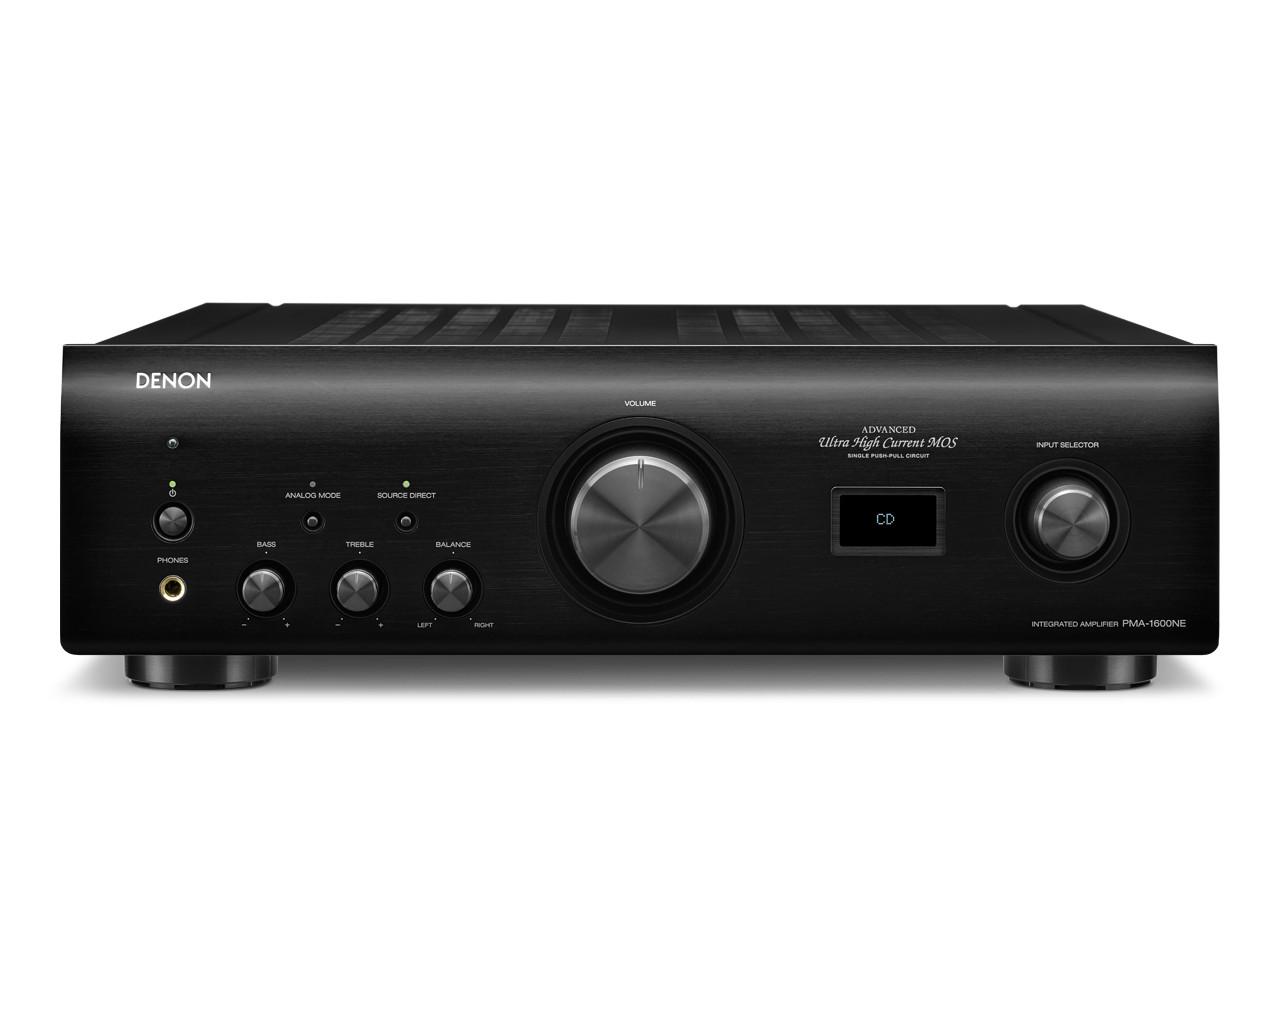 Denon Pma 1600ne Amplifier Buy At Analog Circuits